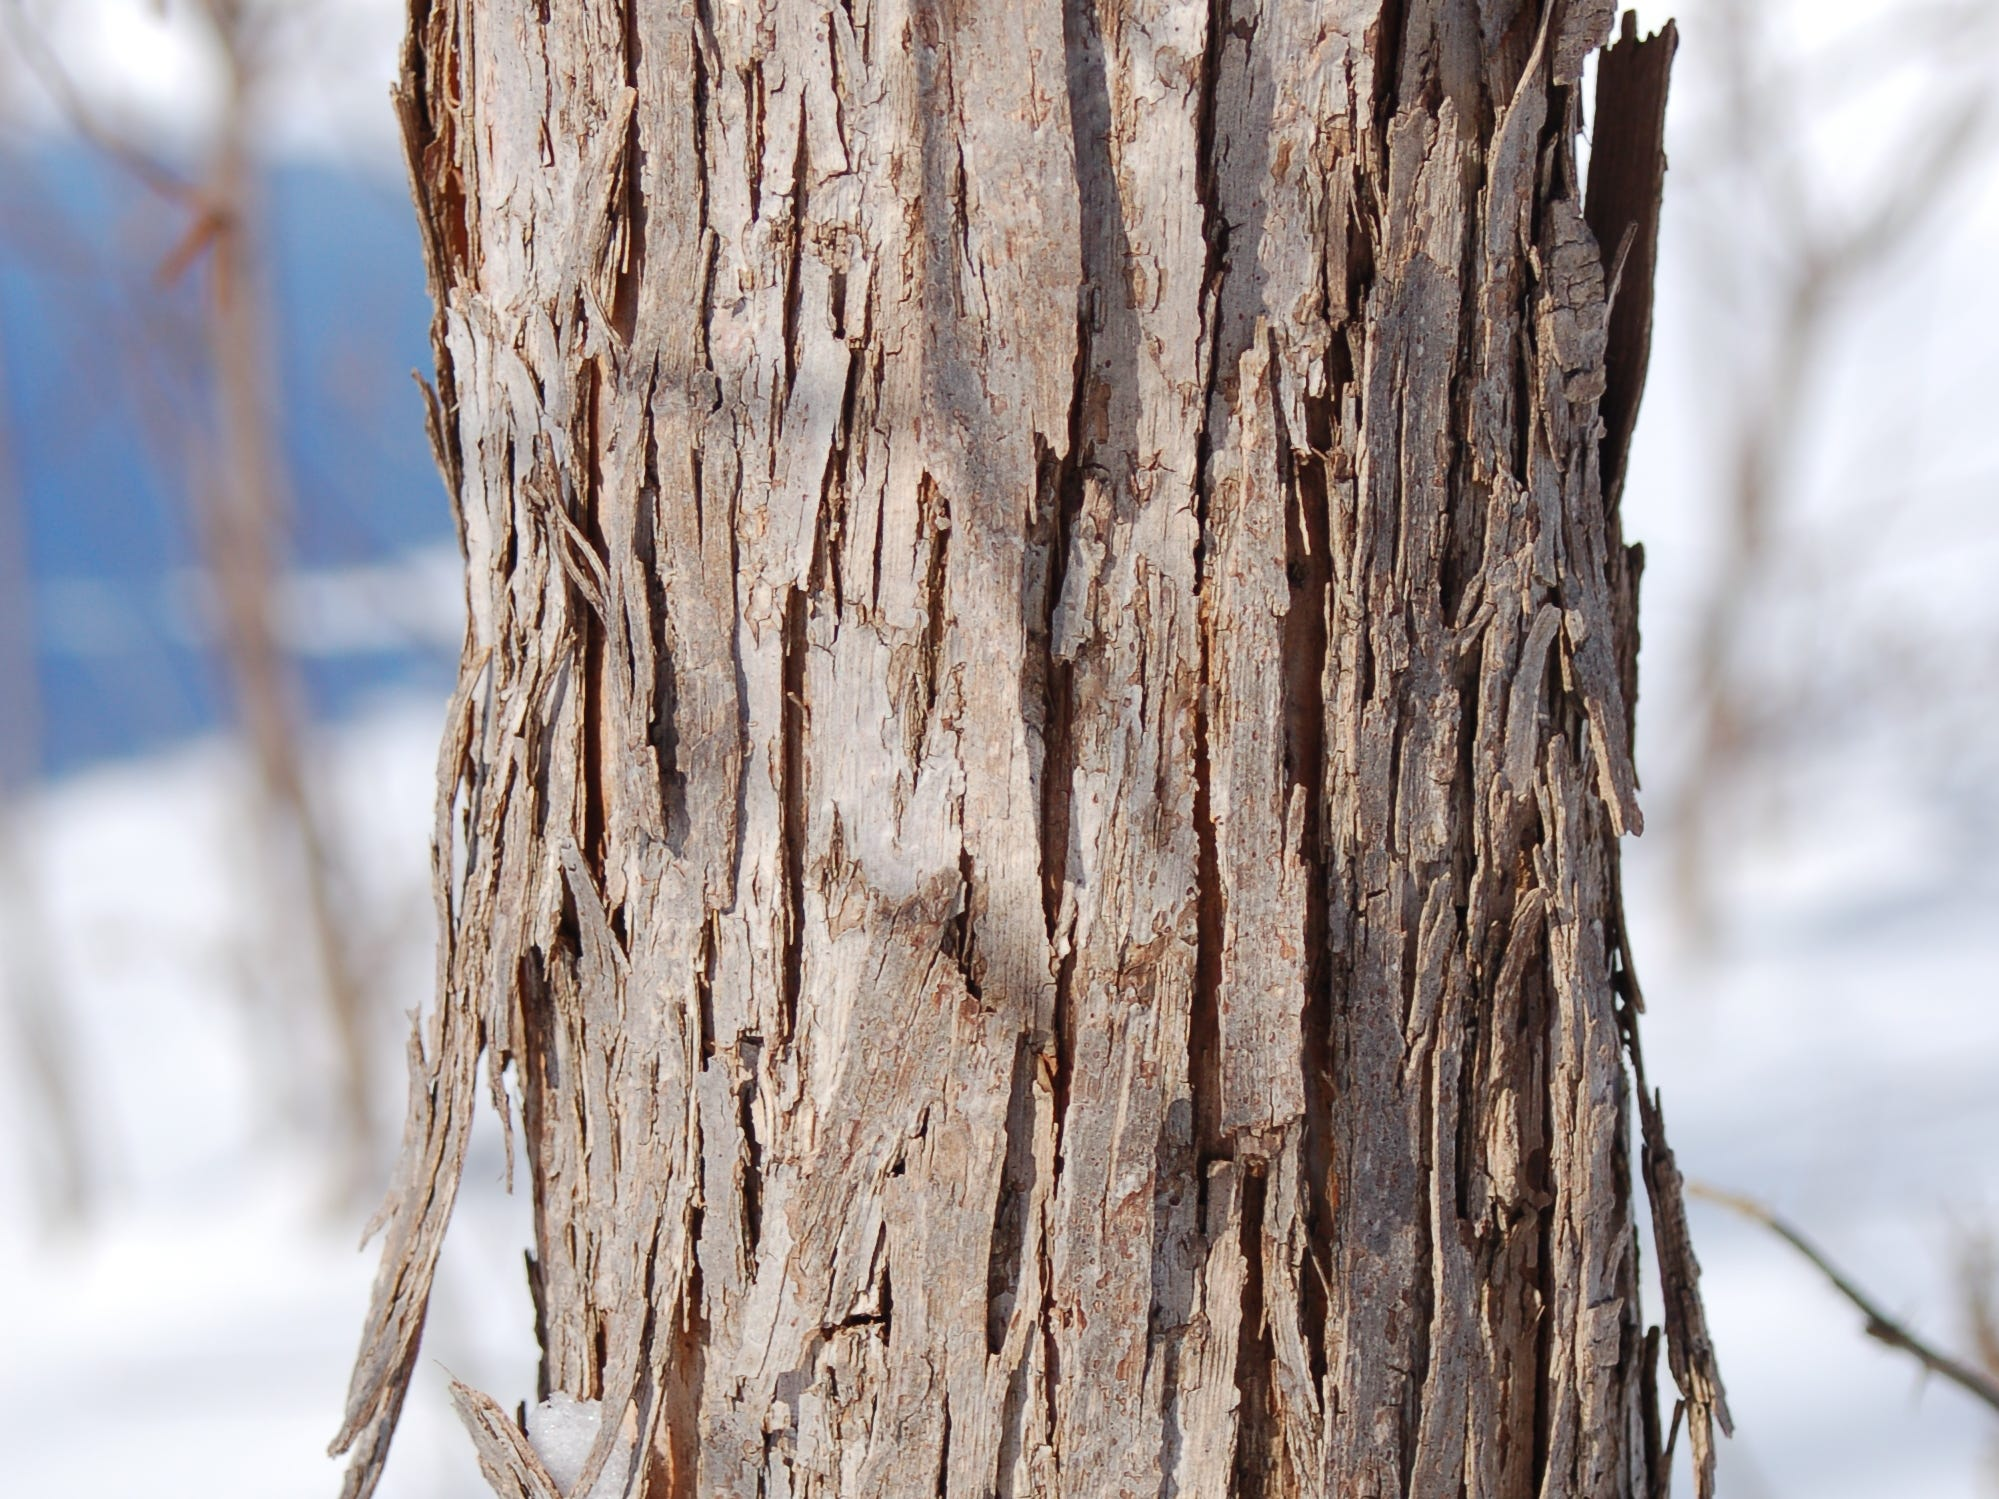 The Ironwood American hophornbeam has flaky, peeling to shreddy bark in long vertical, narrow strips.